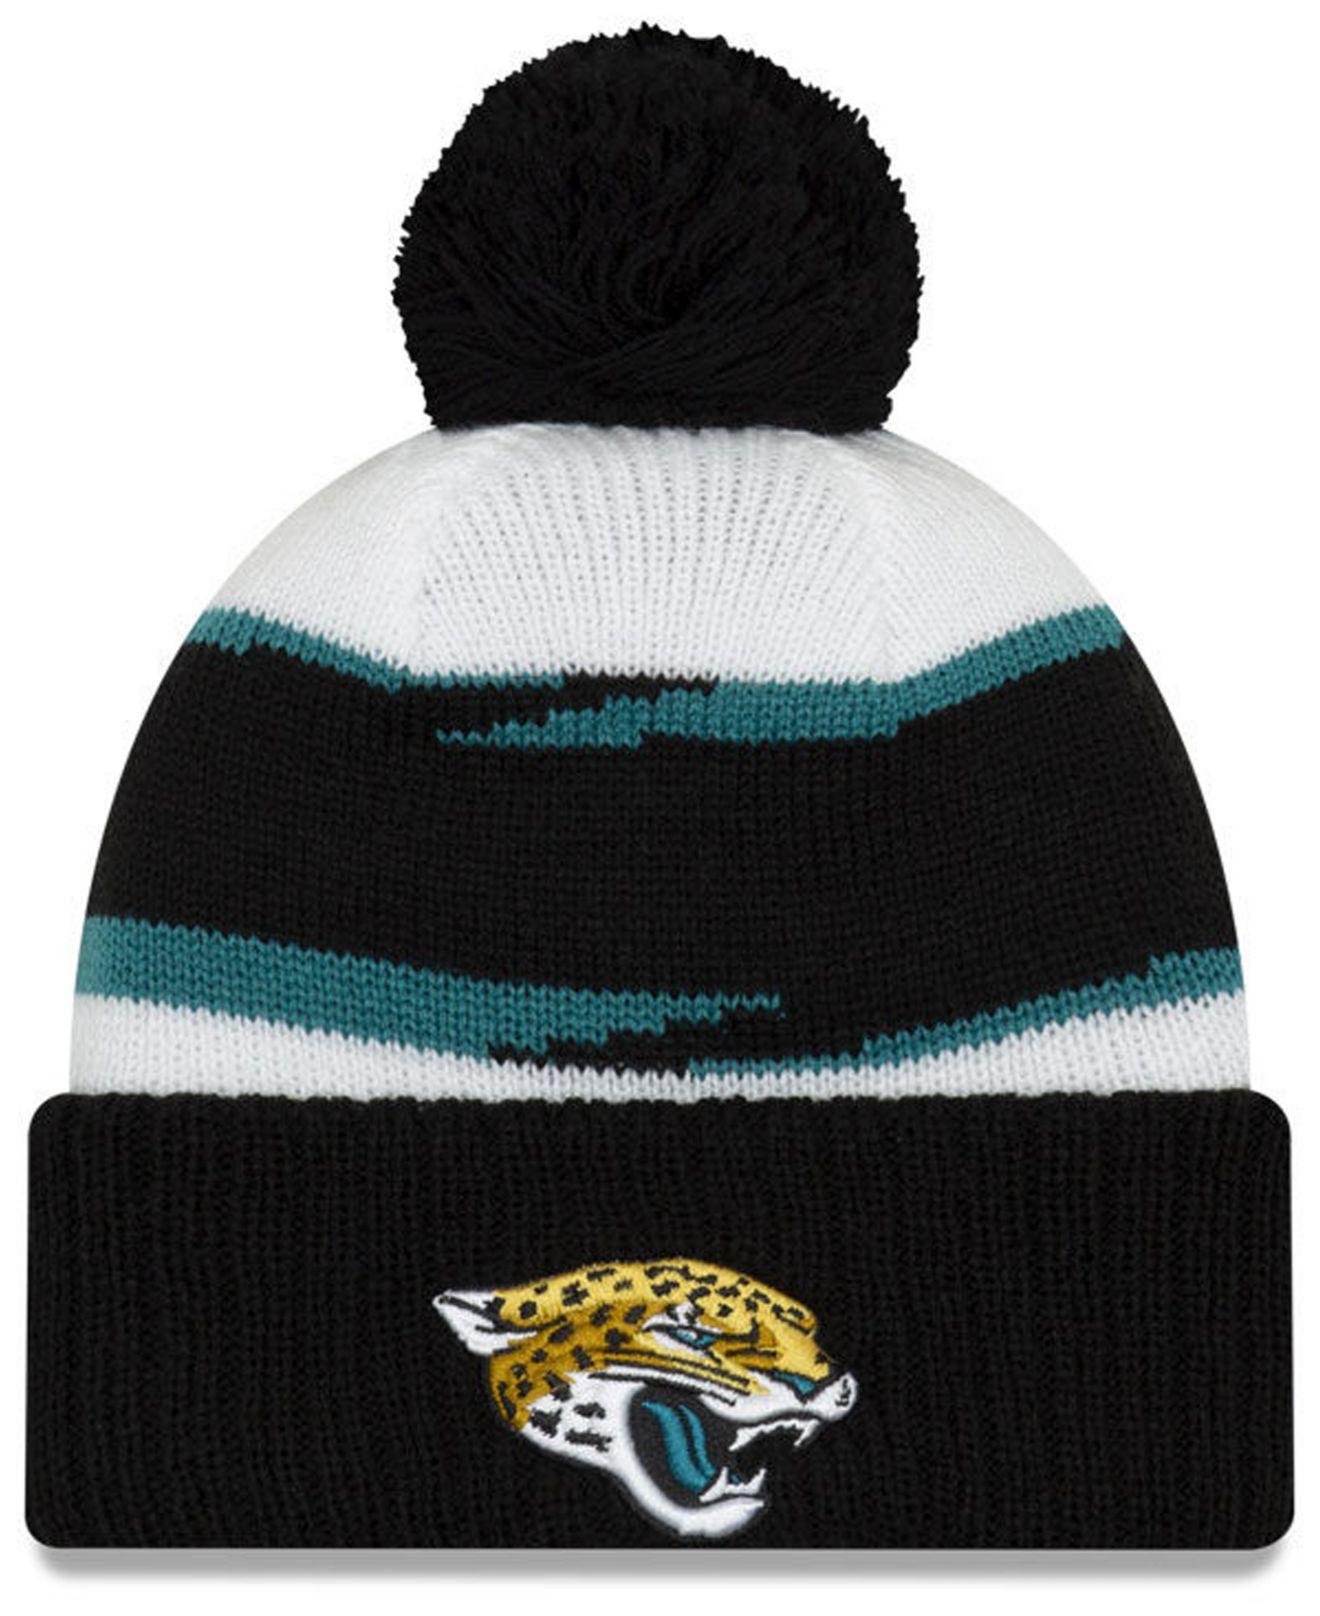 1f0953aea2f Lyst - Ktz Jacksonville Jaguars Thanksgiving Pom Knit Hat in Black ...